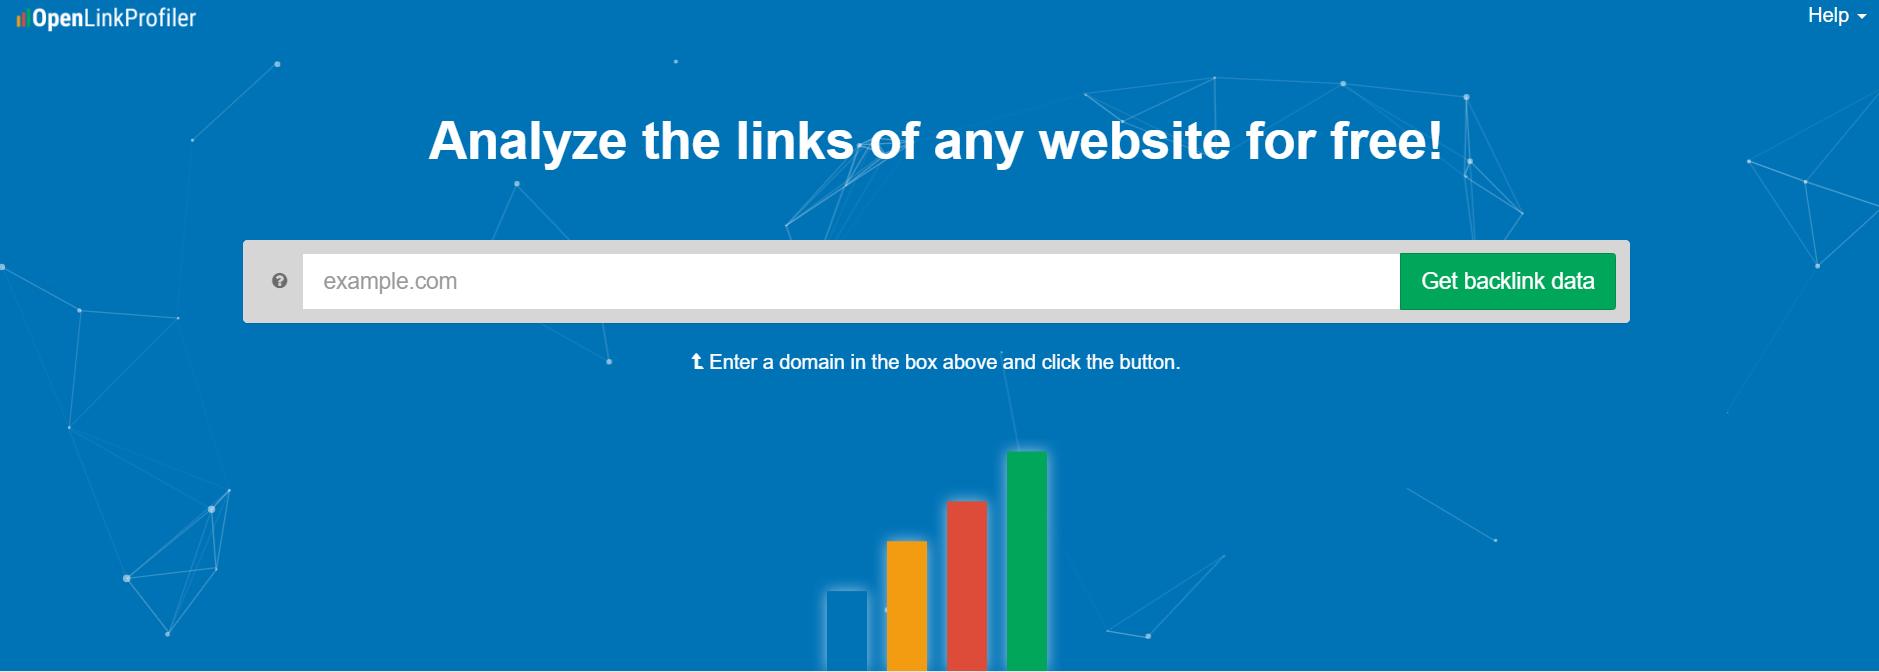 Free link analysis tool- OpenLinkProfiler